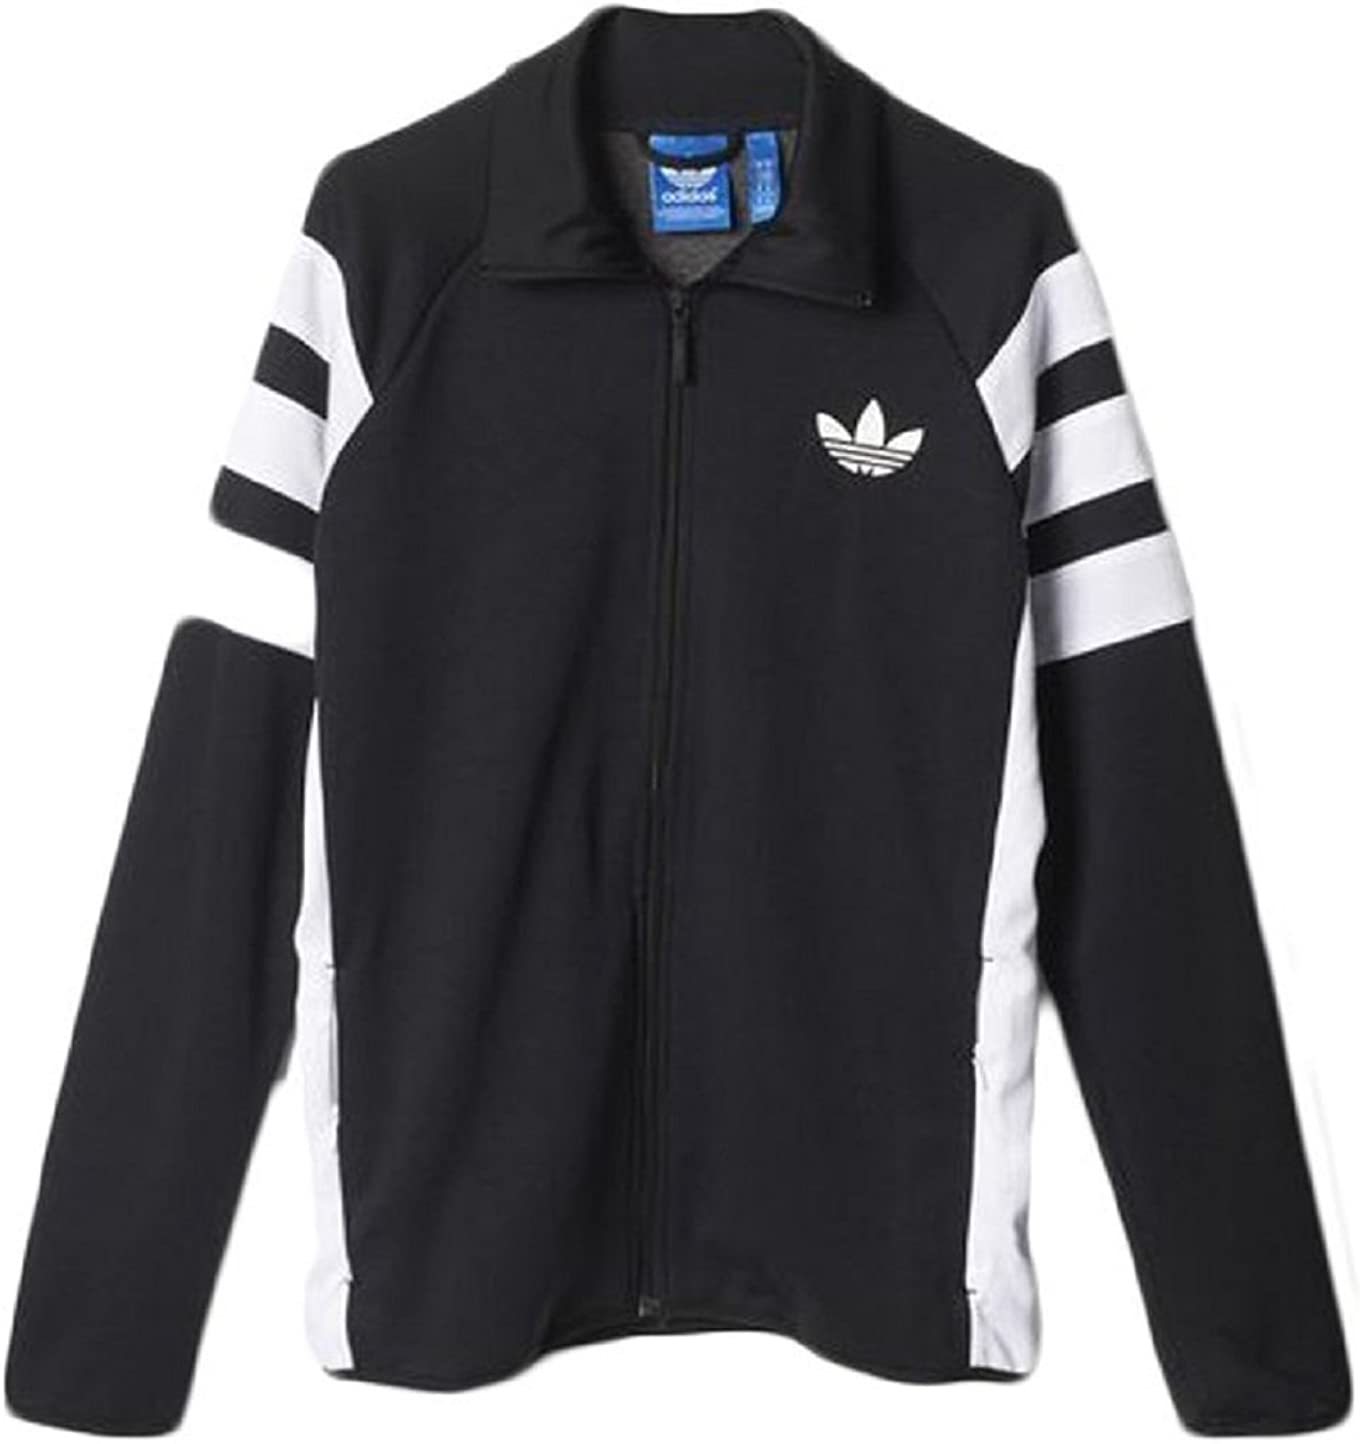 Mansedumbre Engaño Conveniente  Adidas MENS TREFOIL FC TRACK JACKET AJ7677 (XL) BLACK: Amazon.ca ...